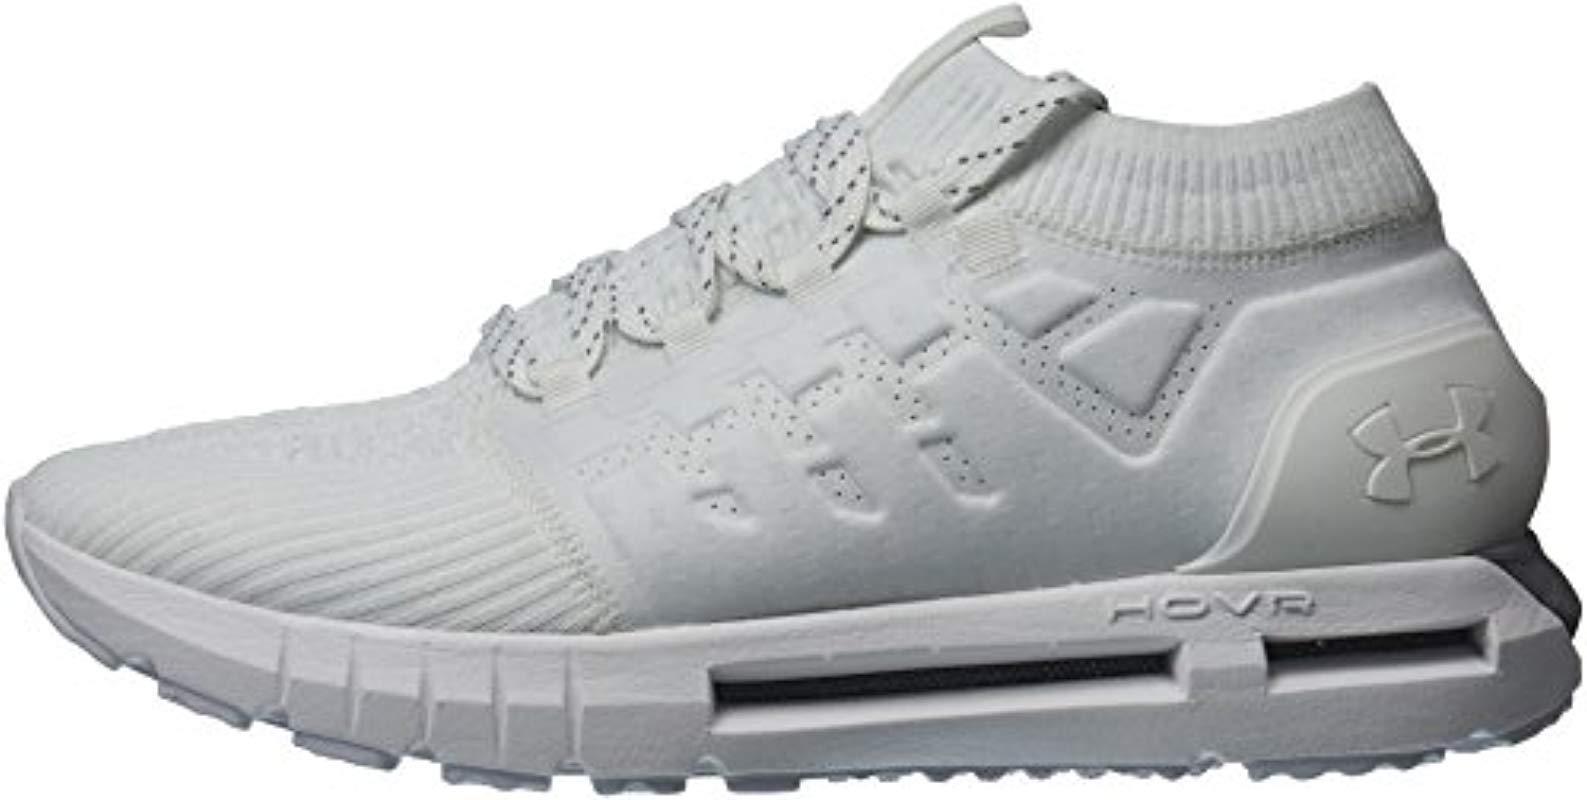 Hovr Phantom Nc Running Shoes